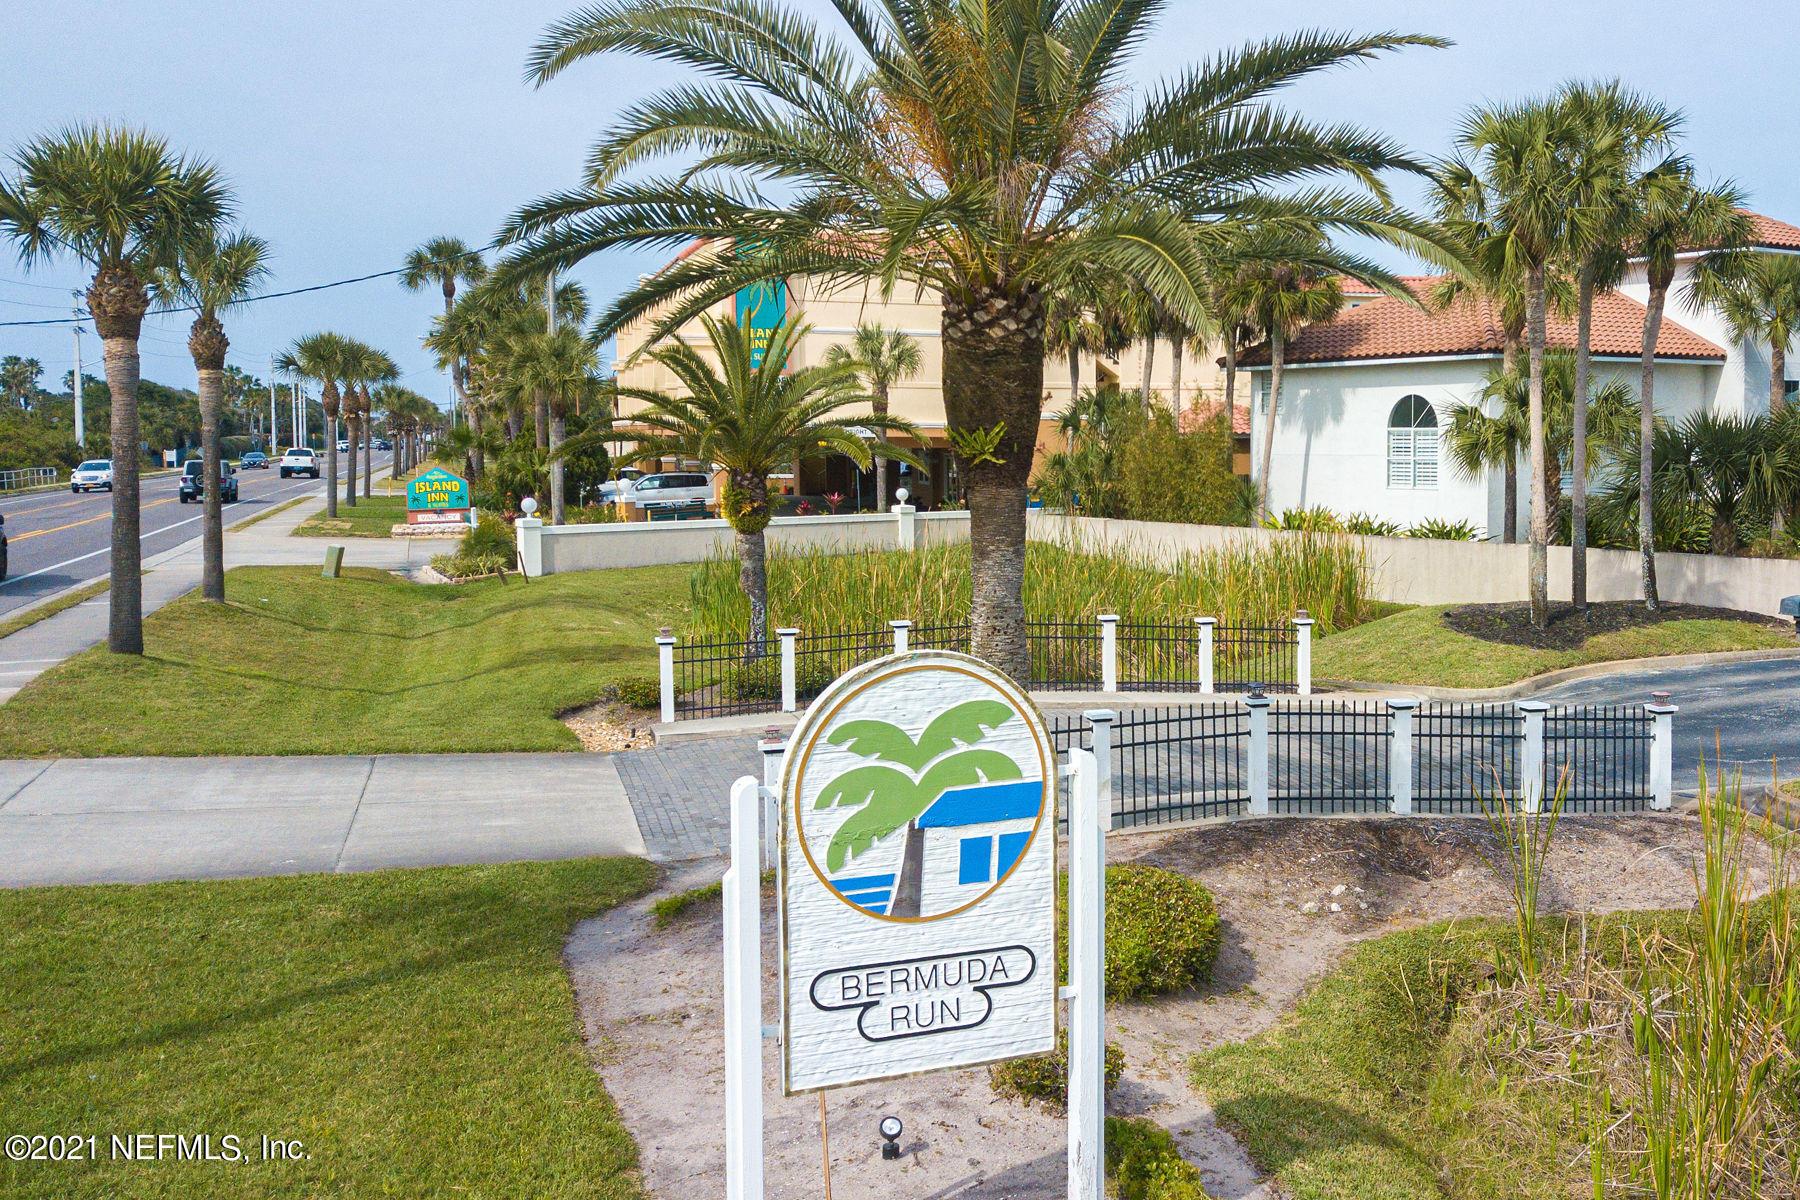 15 BERMUDA RUN, ST AUGUSTINE BEACH, FLORIDA 32080, ,Vacant land,For sale,BERMUDA RUN,1104506